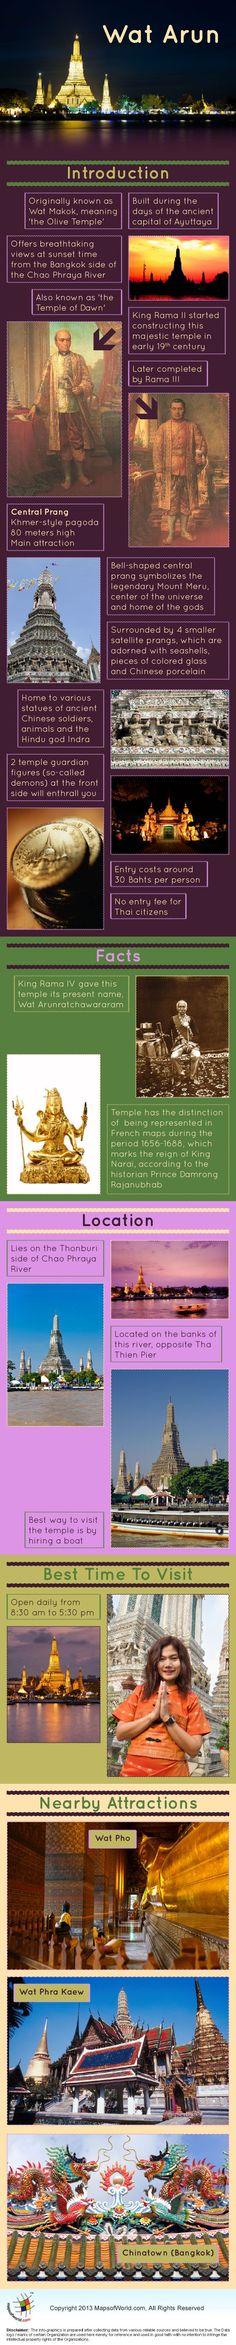 Wat Arun, Thailand - Infographics, Facts, Travel Destination